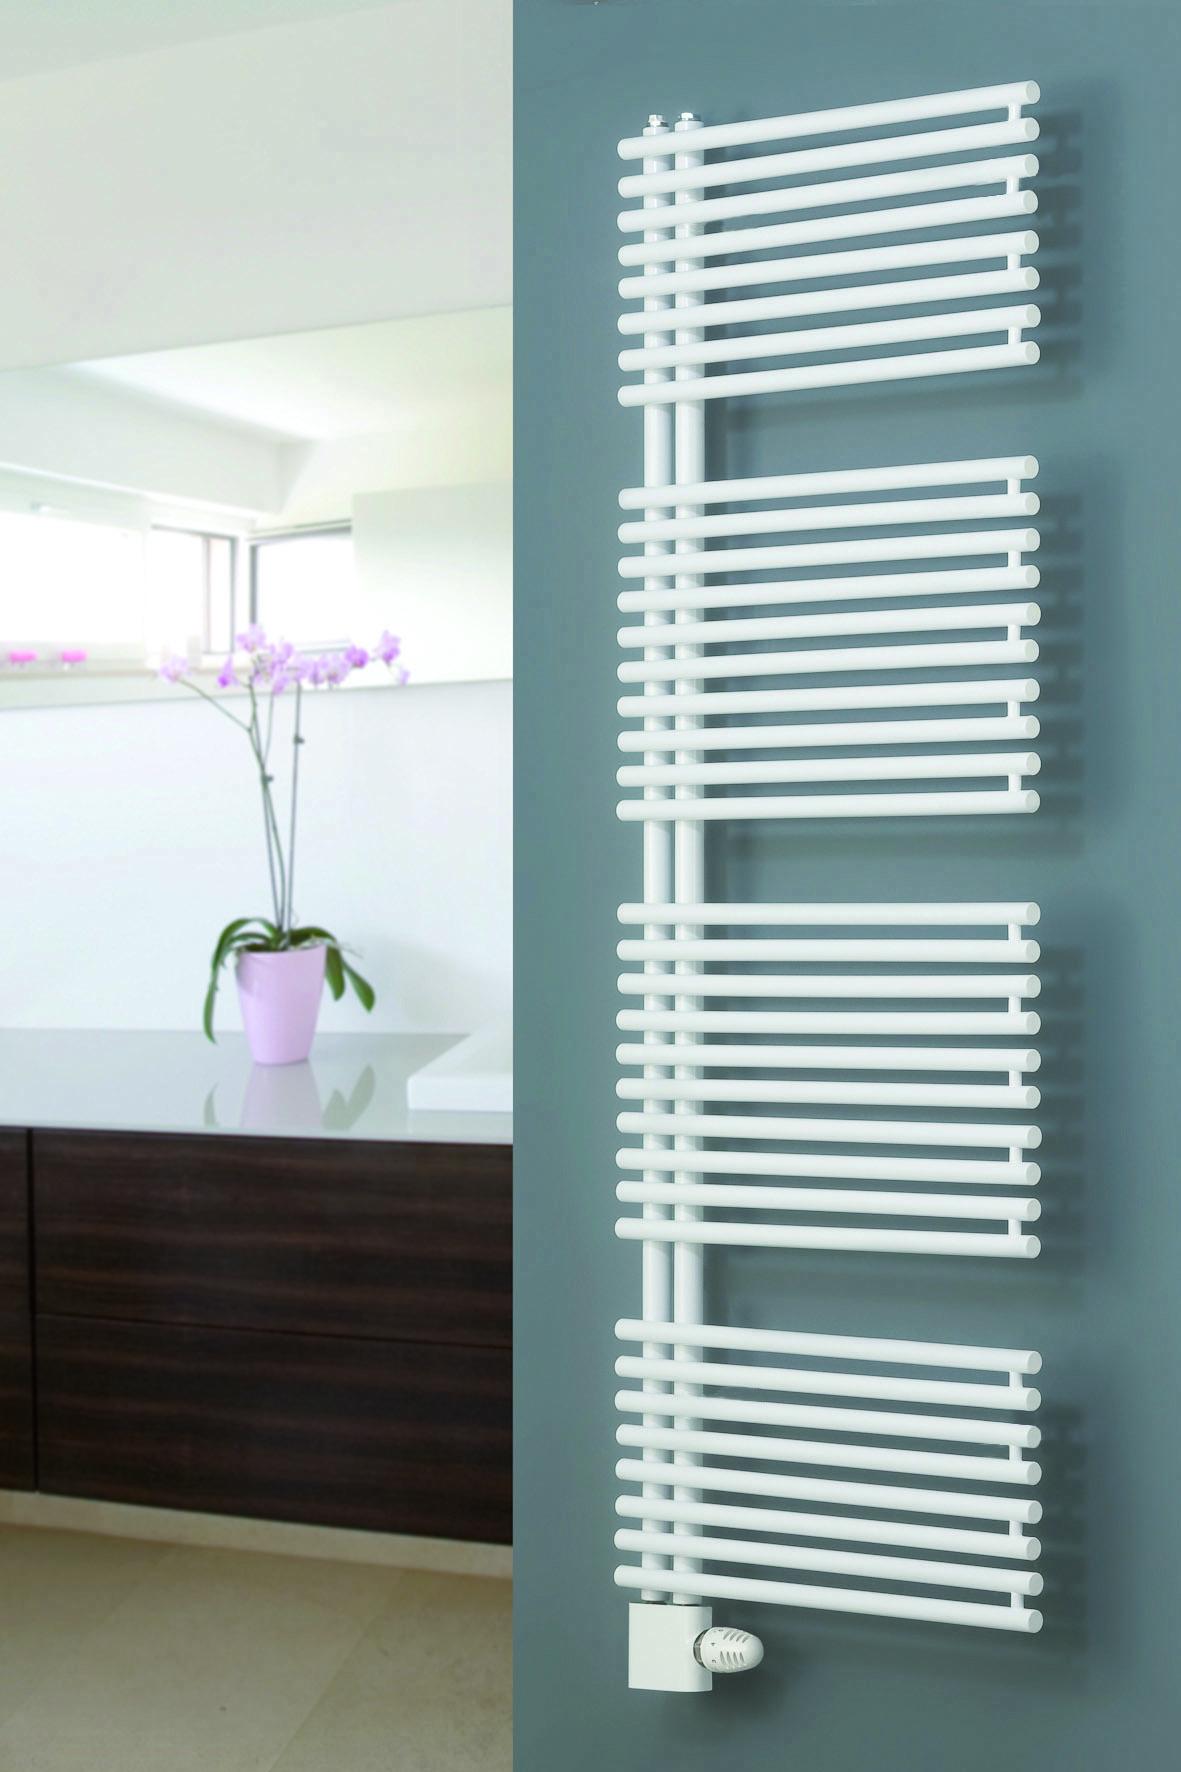 badheizk rper als raumteiler 1800 x 500 mm 1023 watt heizk rper badheizk rper. Black Bedroom Furniture Sets. Home Design Ideas